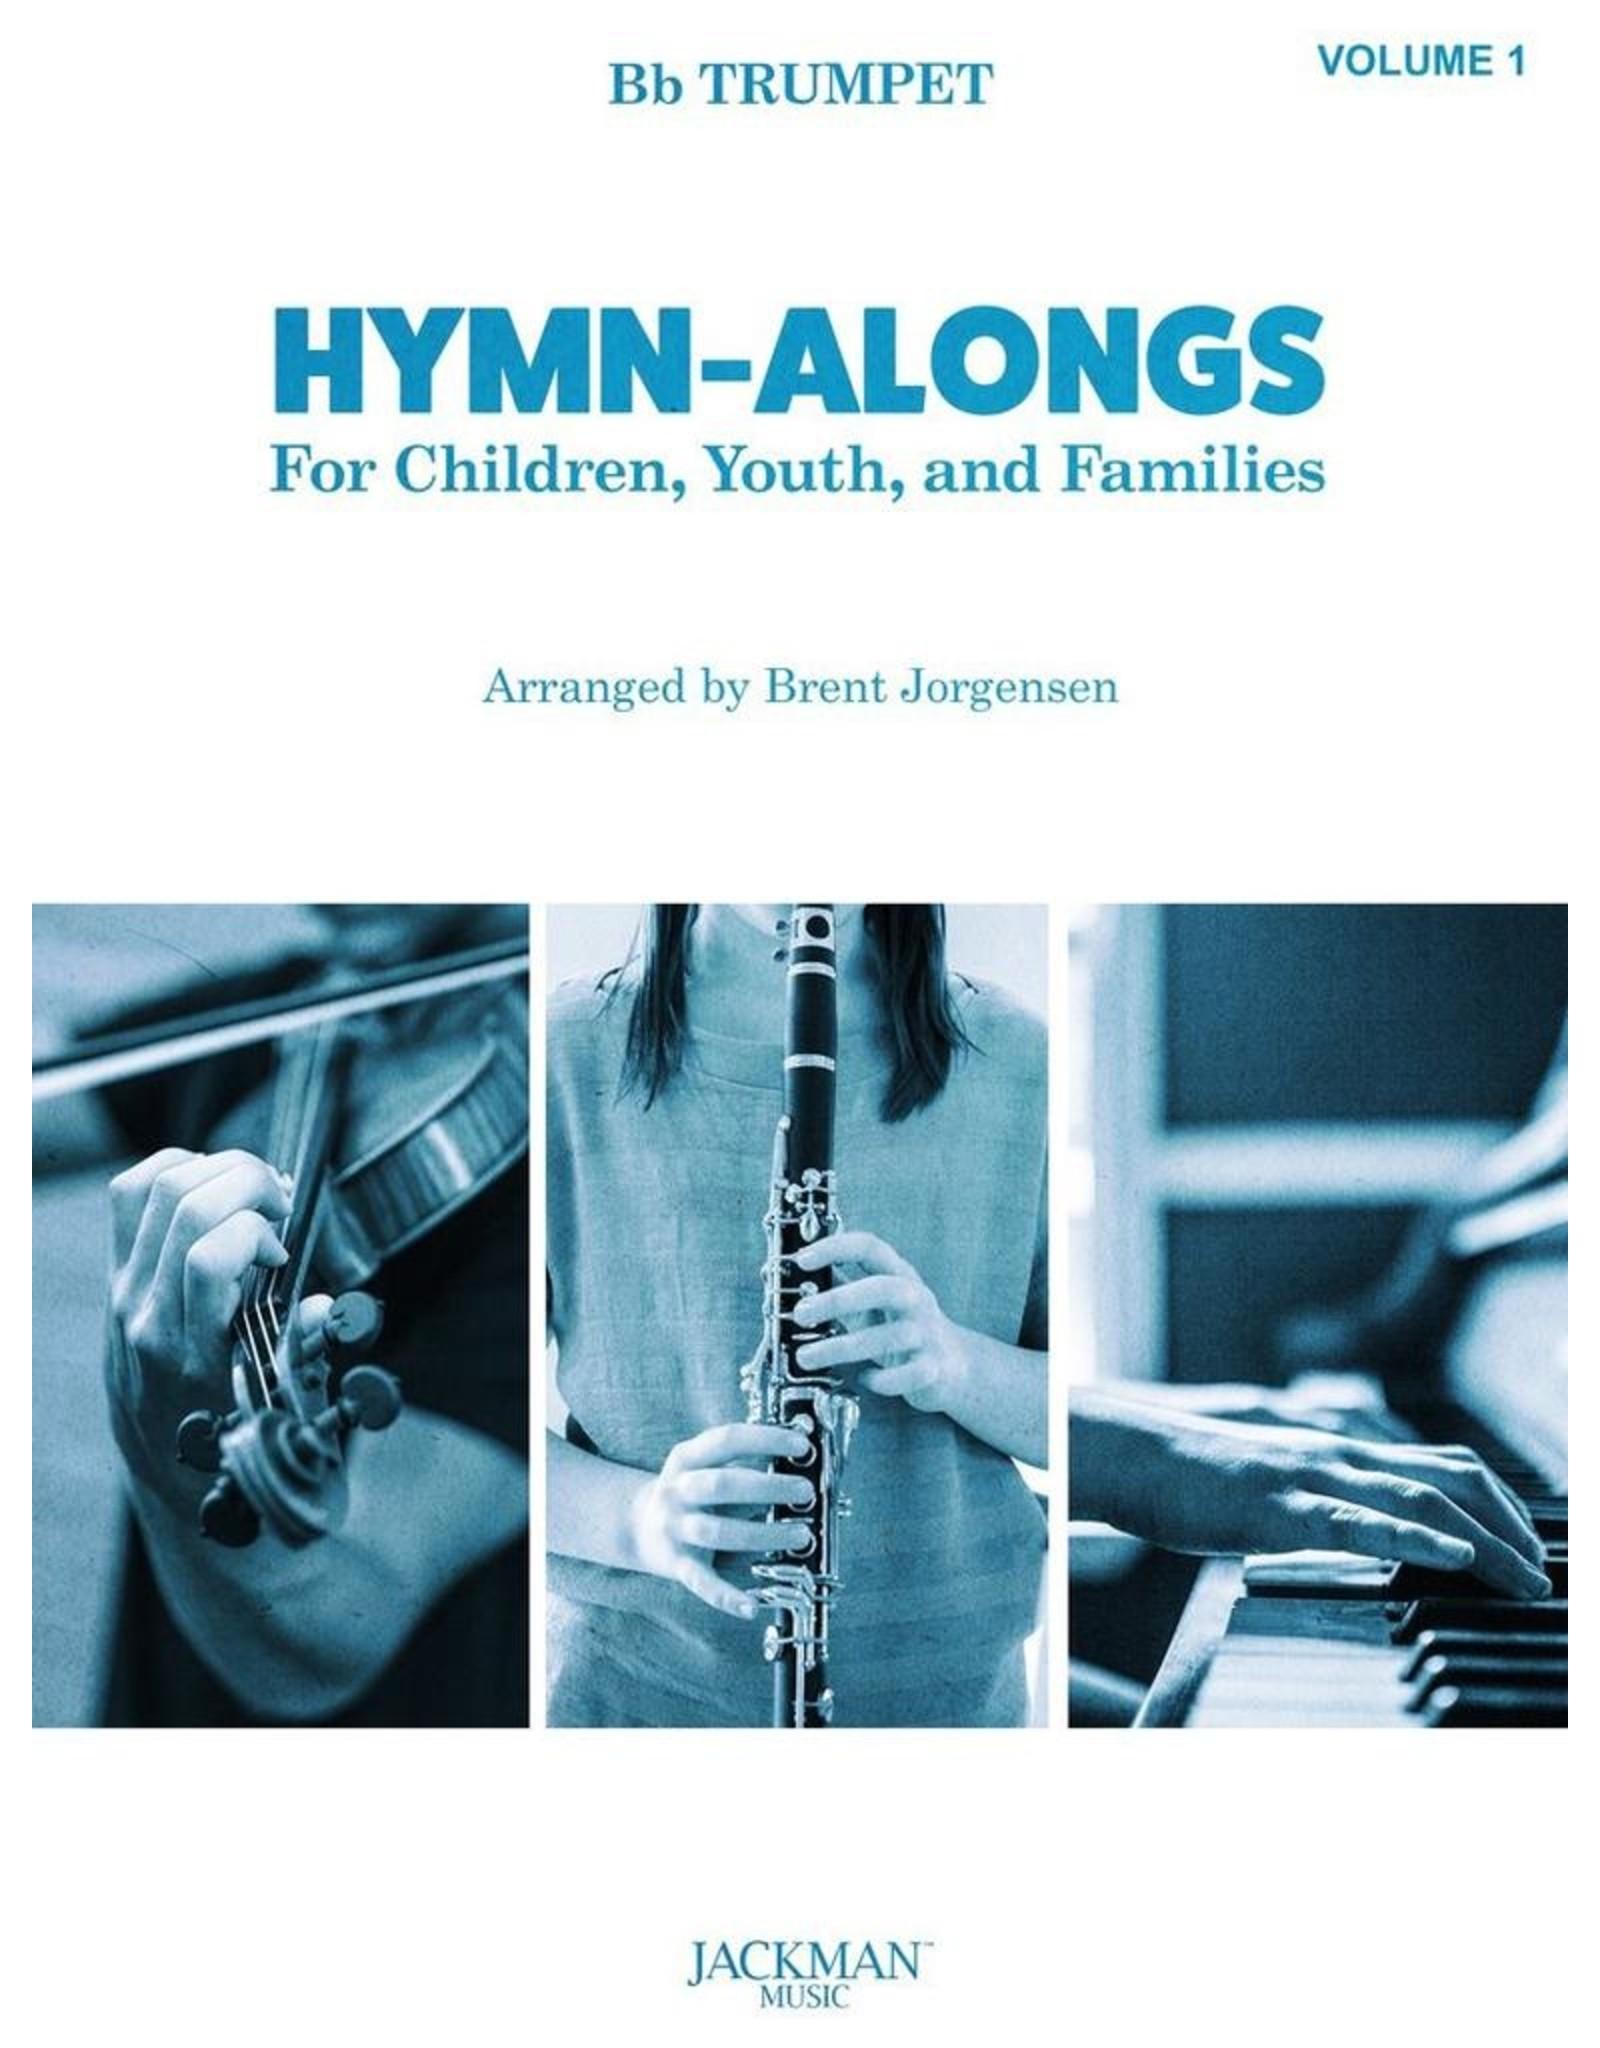 Jackman Music Hymn-Alongs Vol. 1 - arr. Brent Jorgensen - Trumpet